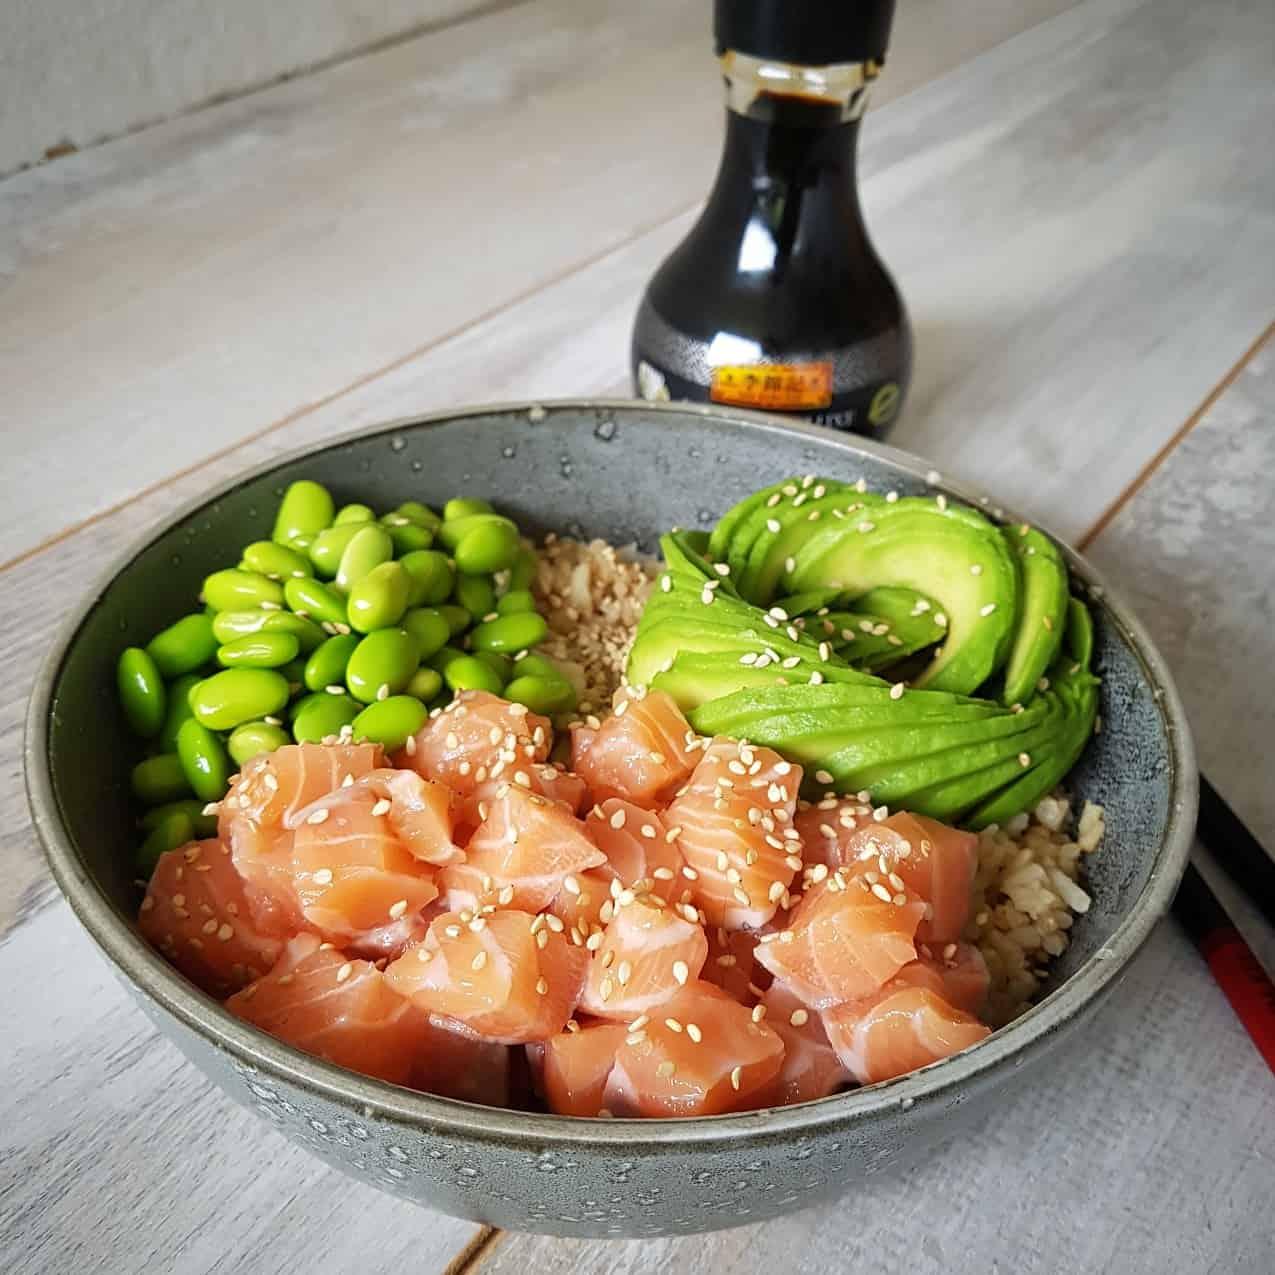 Sushibowl met zalm, avocado en edamame (sojabonen)